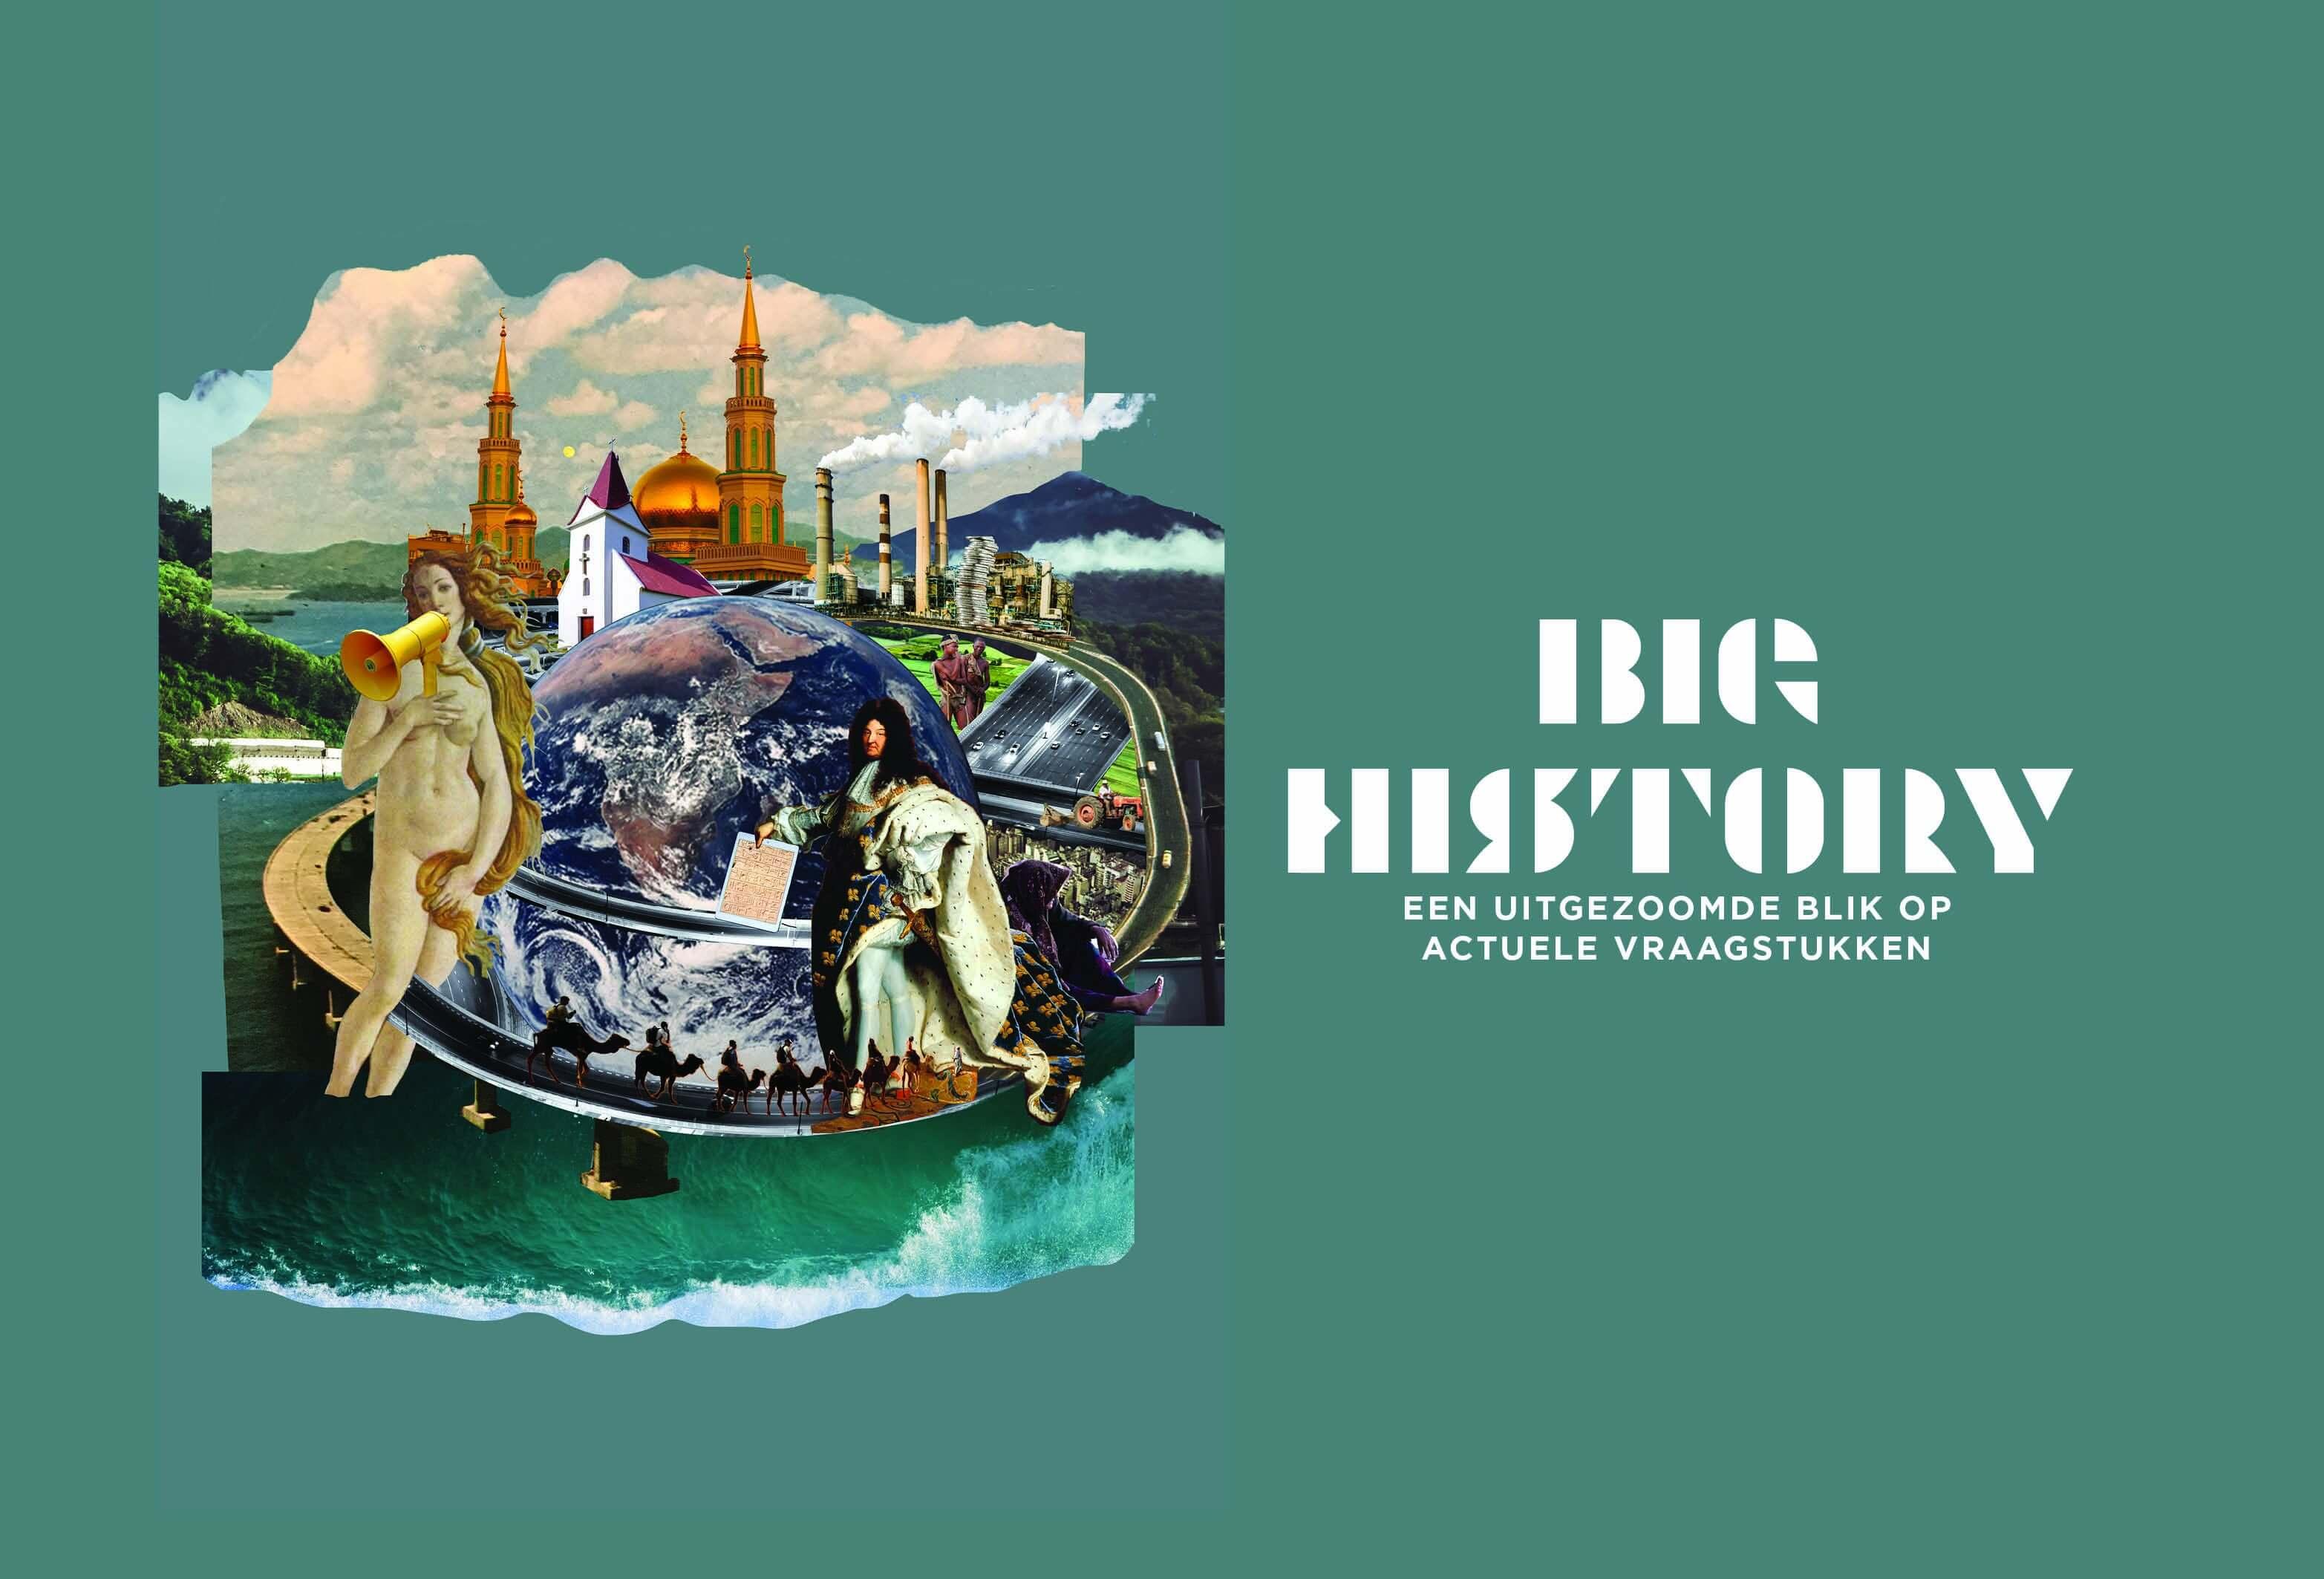 Big History in TivoliVredenburg